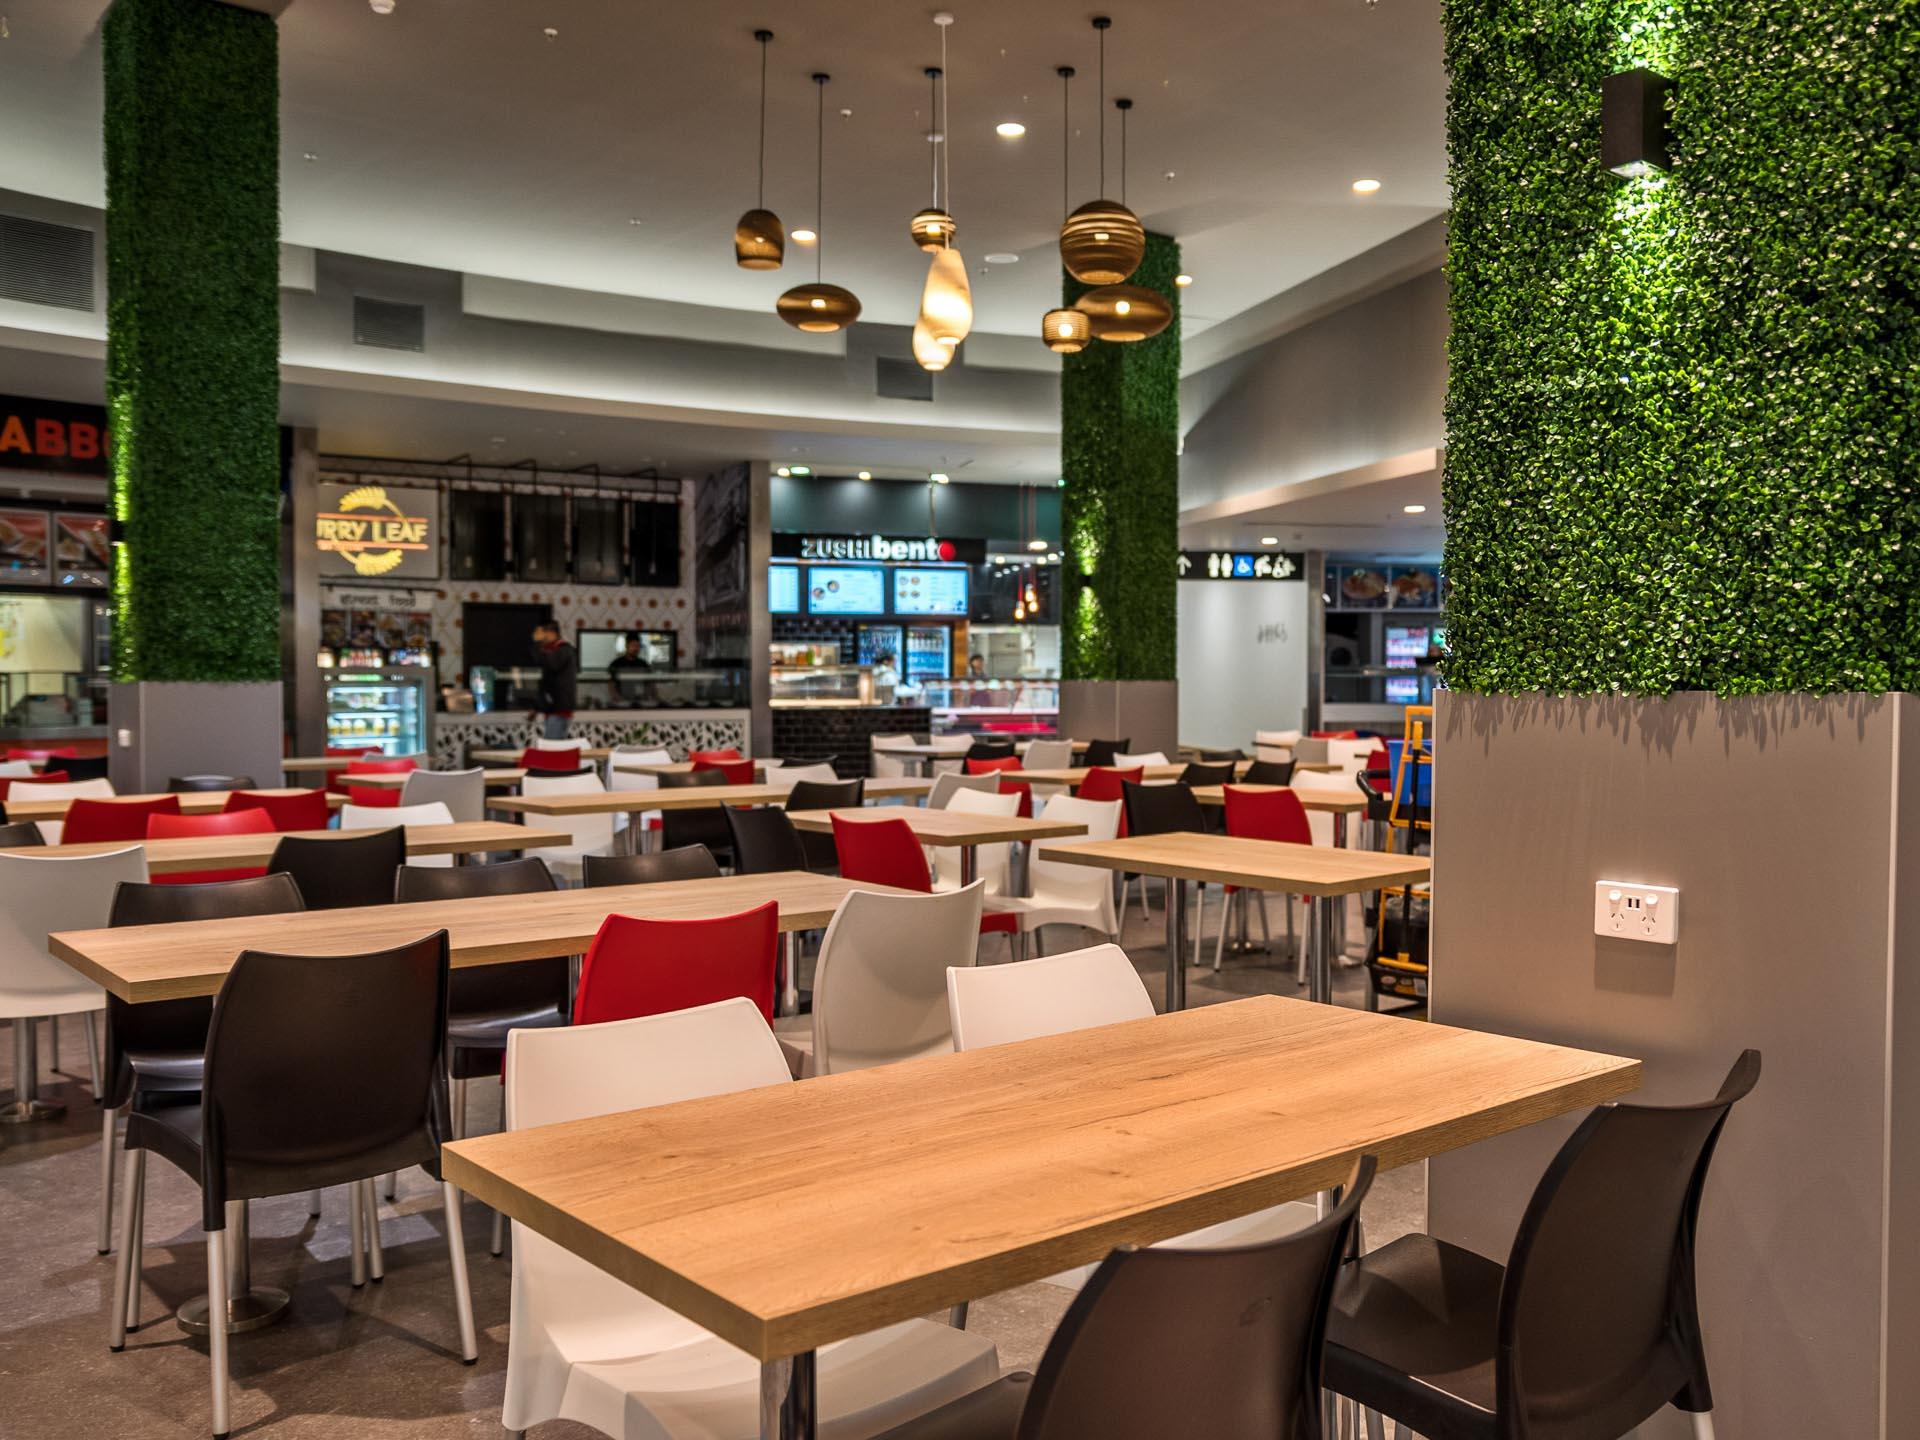 WEB Lakeside Joondalup Shopping Centre 12